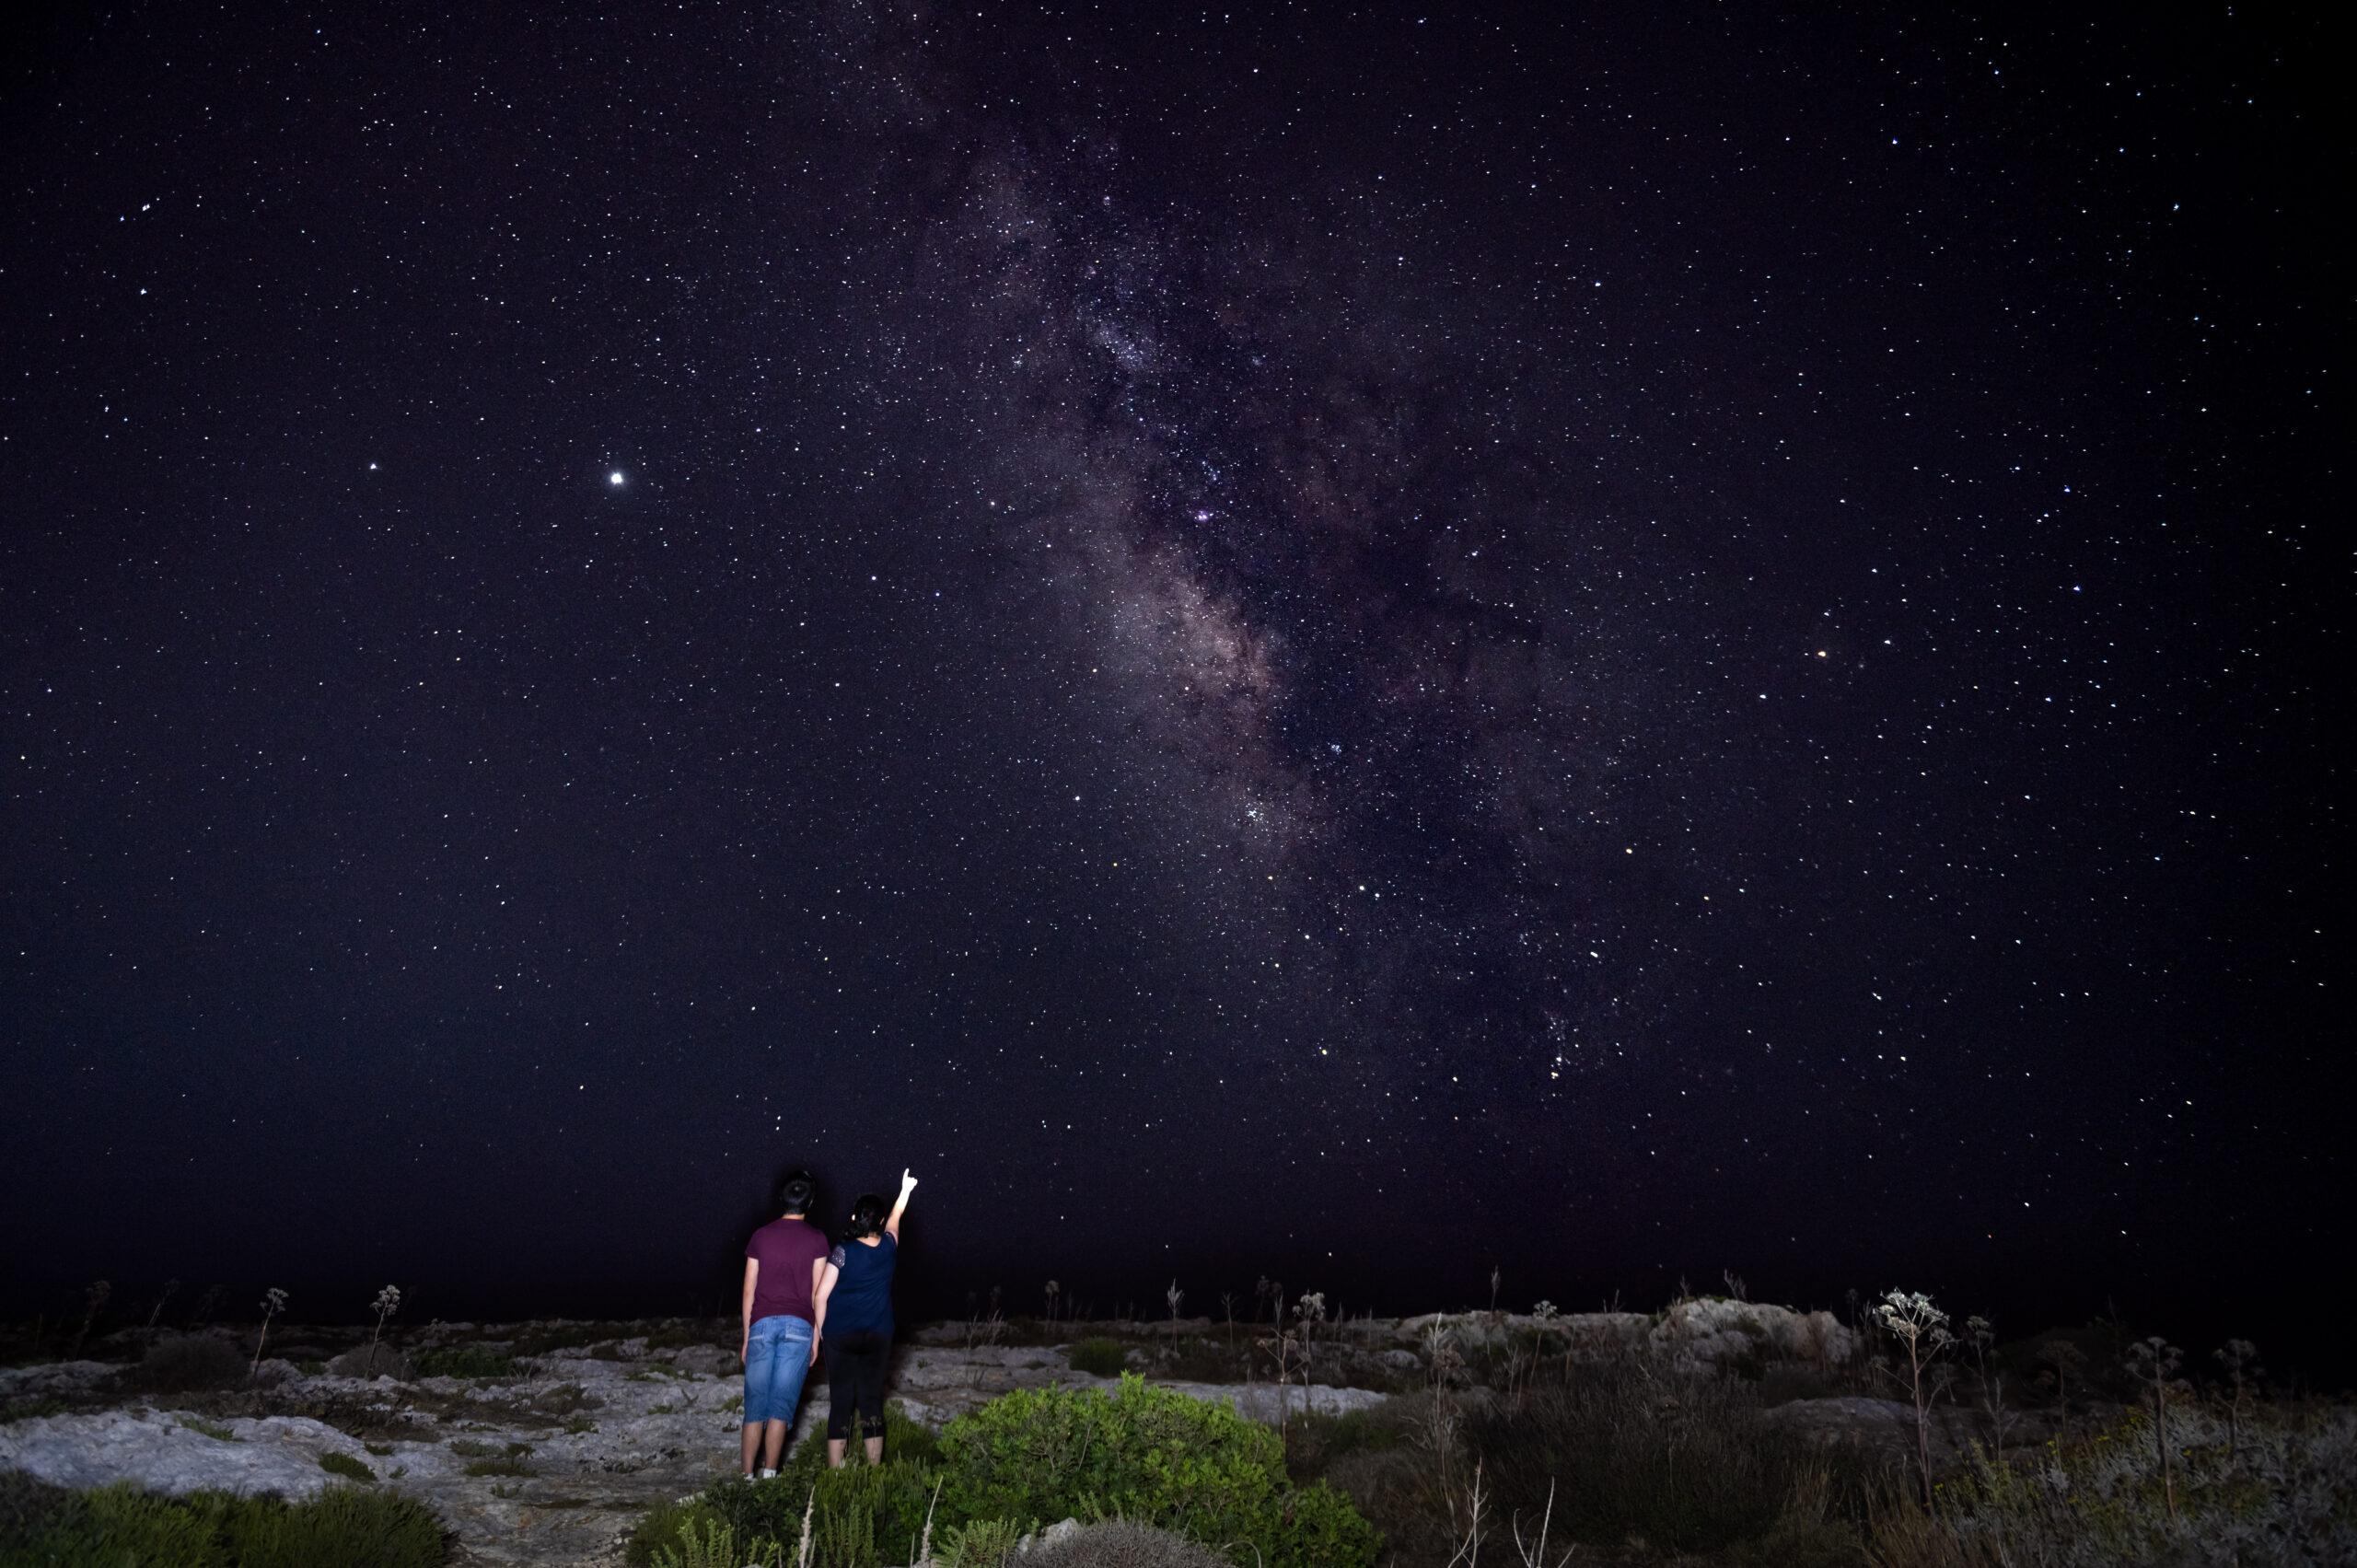 The Milky Way from Dingli Cliffs, Malta. Photo: Ian Noel Pace